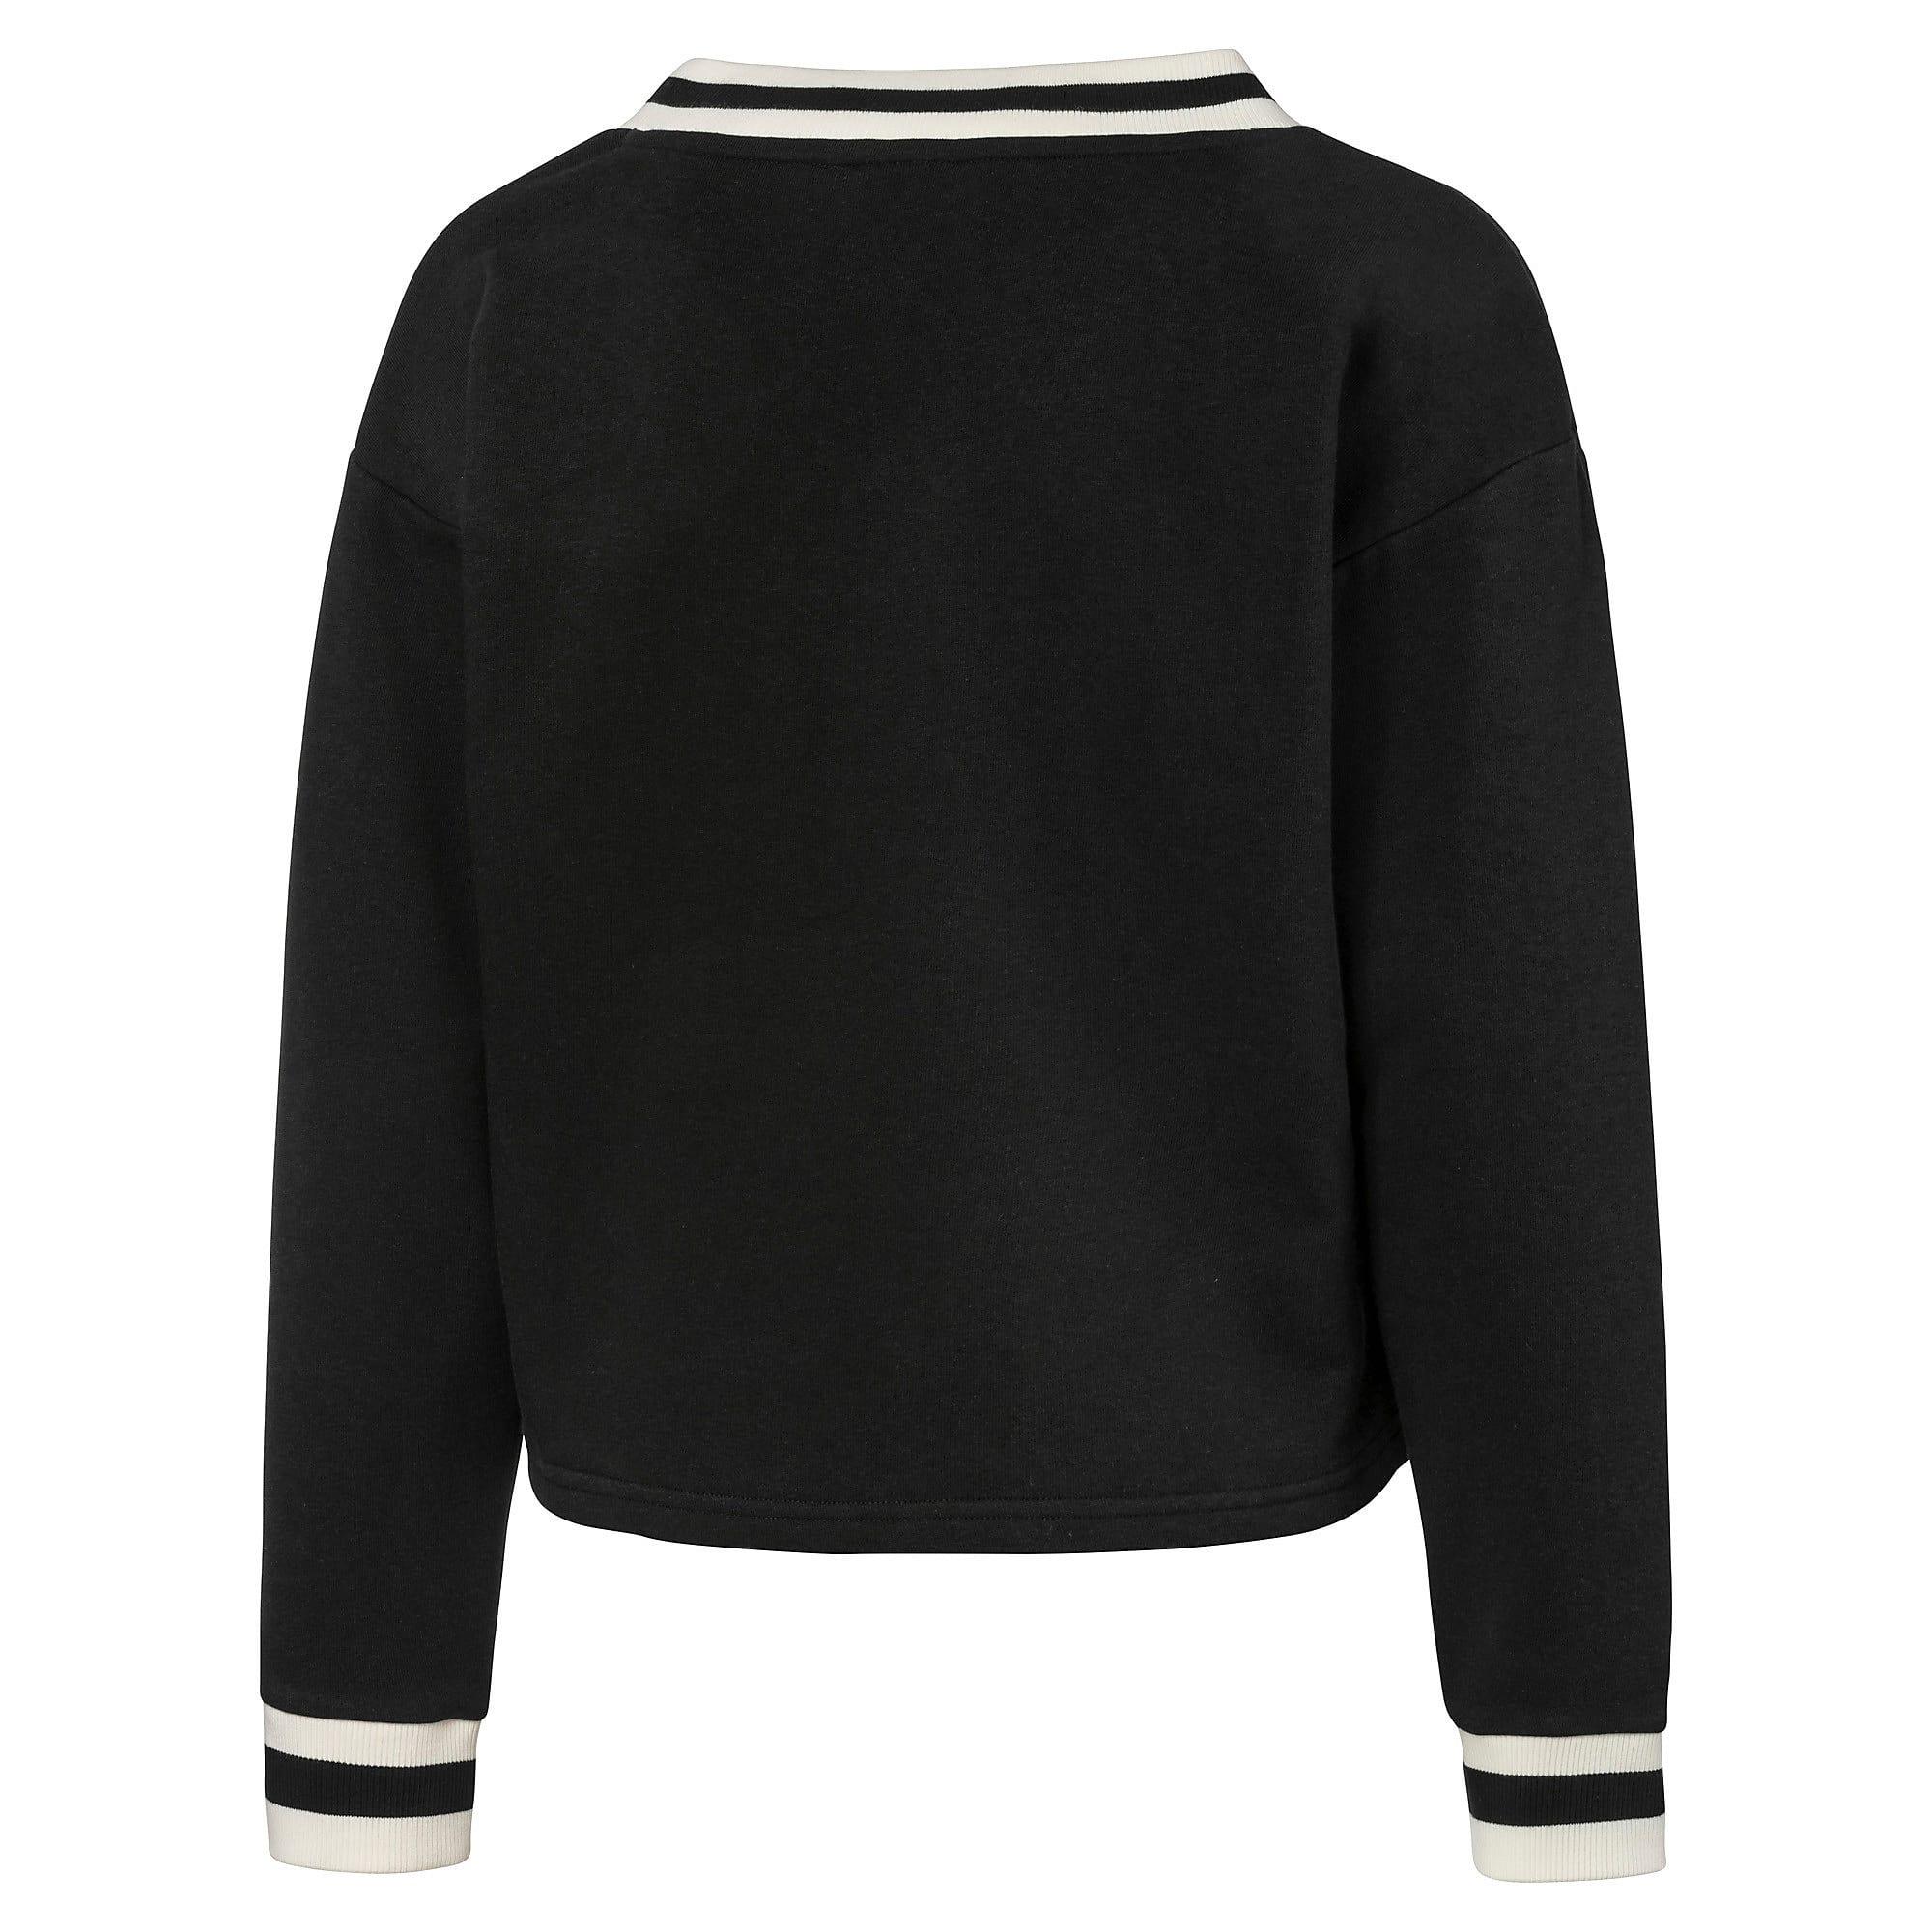 Thumbnail 3 of PUMA x SUE TSAI ウィメンズ Vネック セーター, Puma Black, medium-JPN